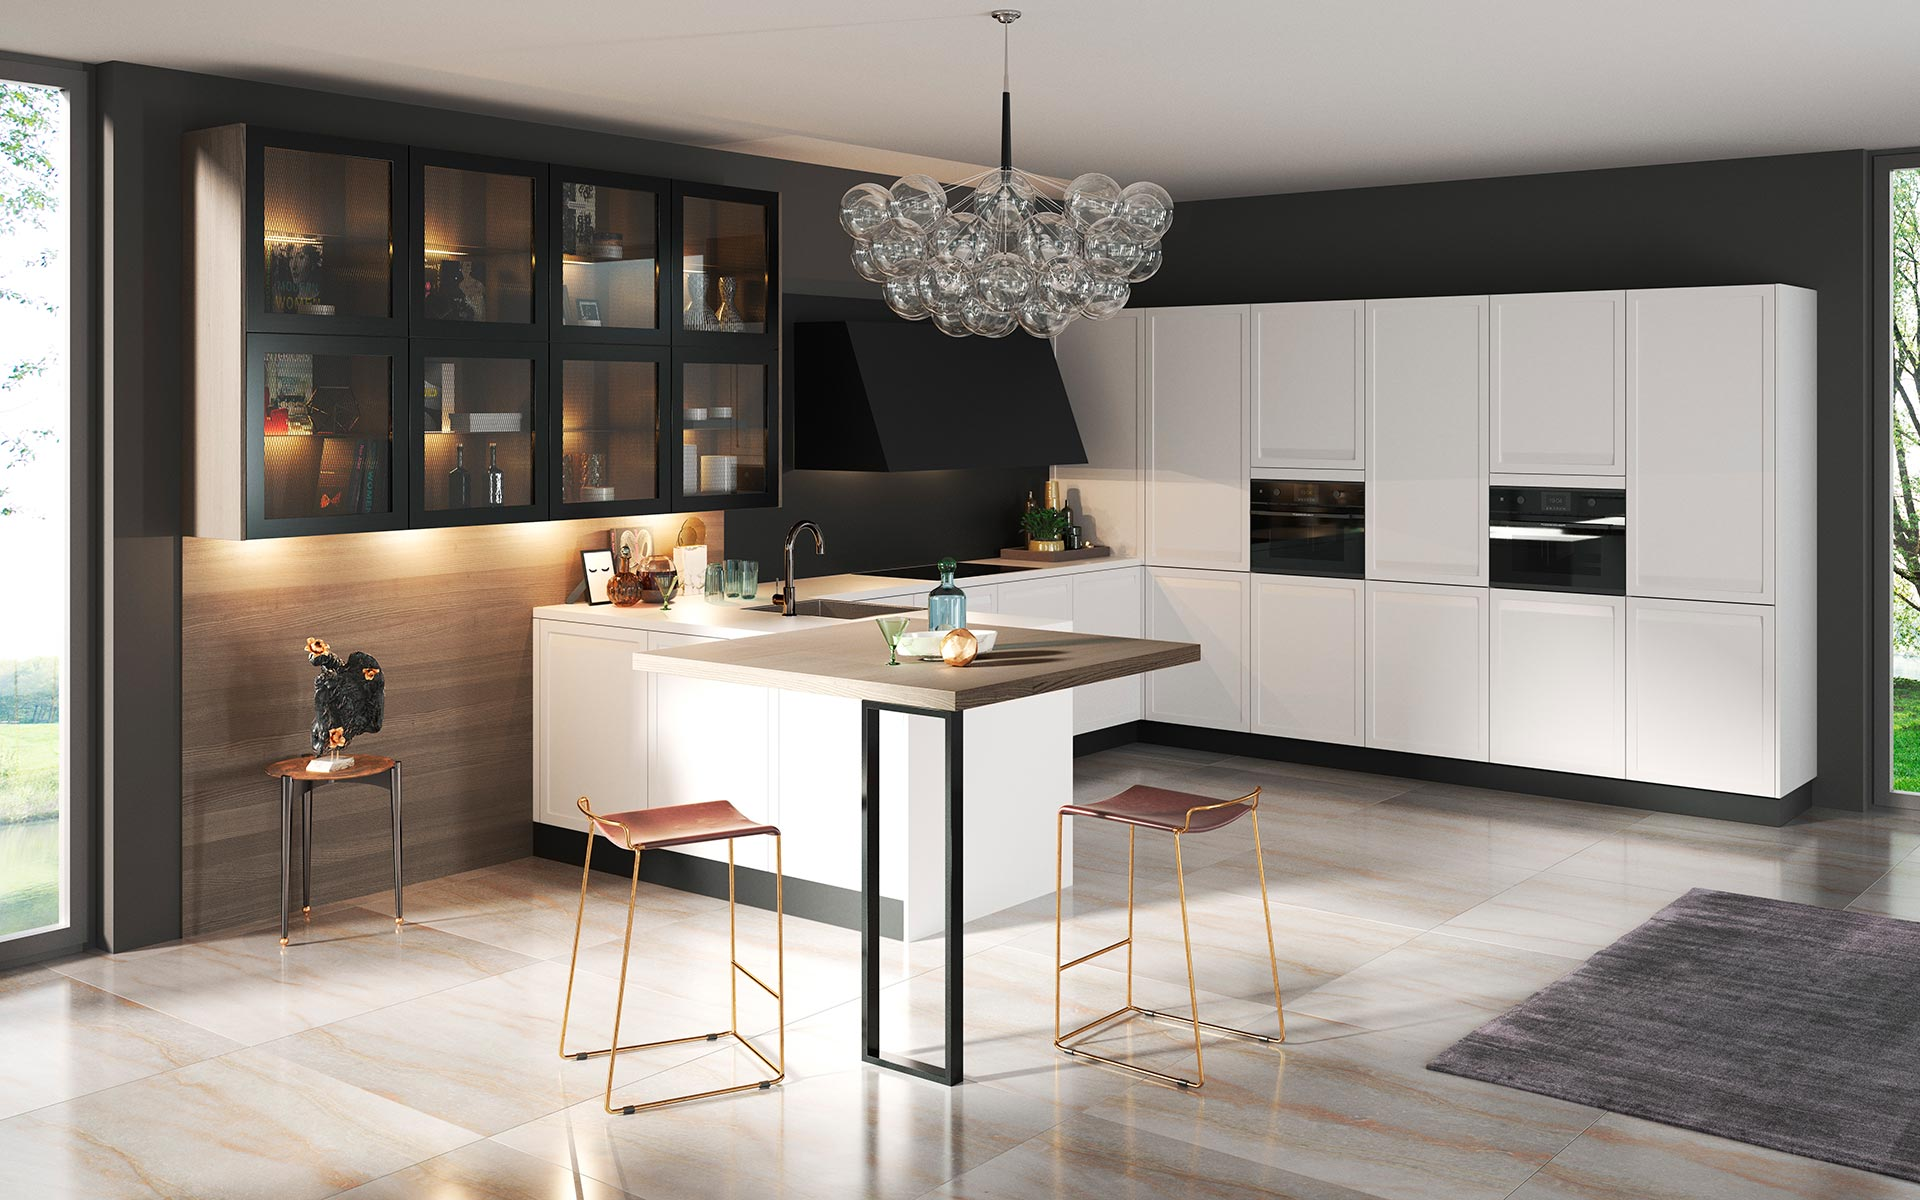 k chendesign fontaine k che auf den punkt gebracht home. Black Bedroom Furniture Sets. Home Design Ideas